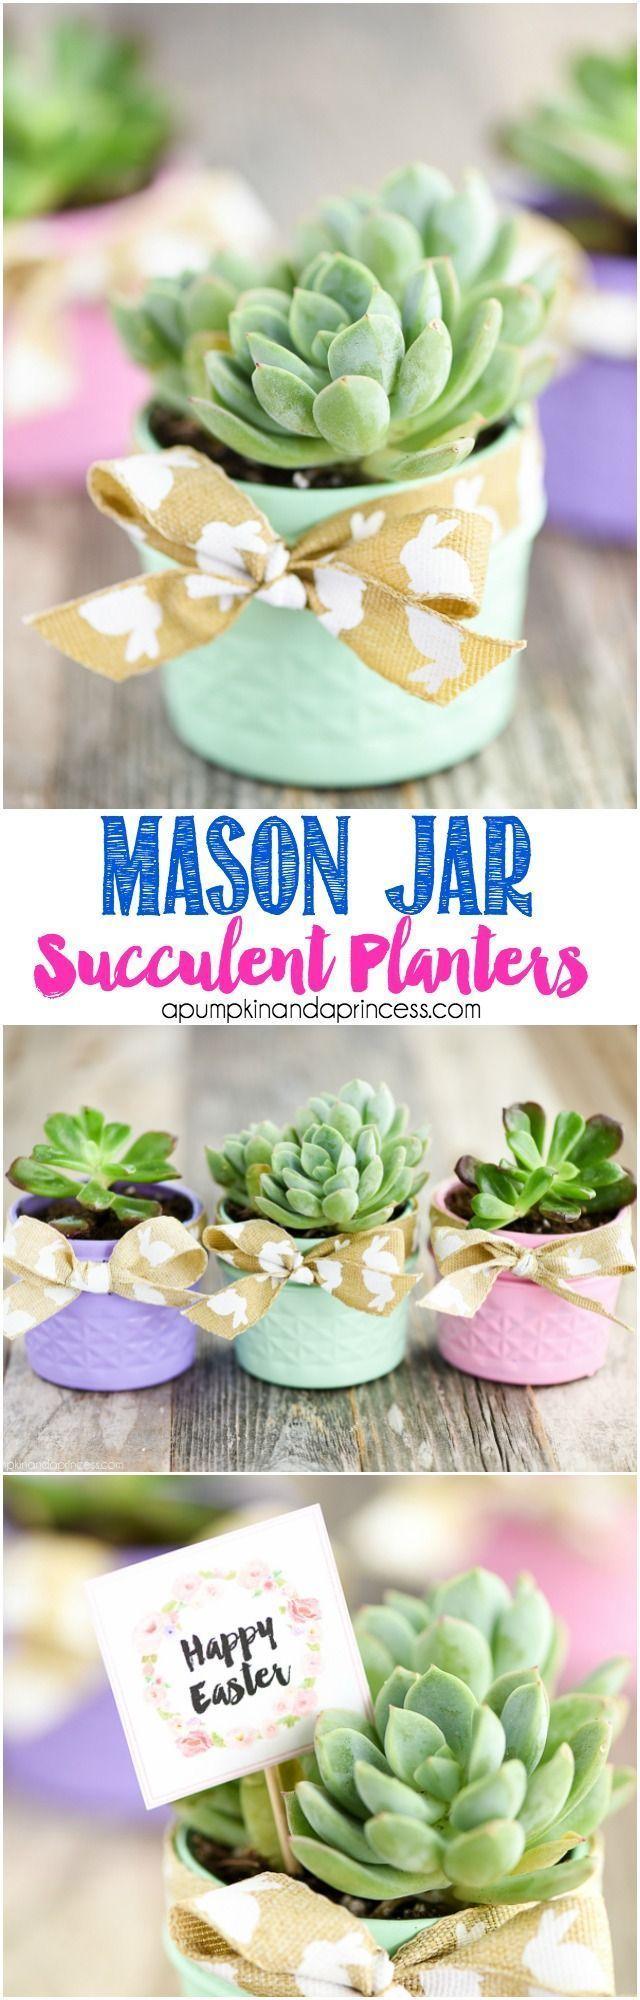 The 25 best mason jar planter ideas on pinterest mason for Indoor plant gift ideas